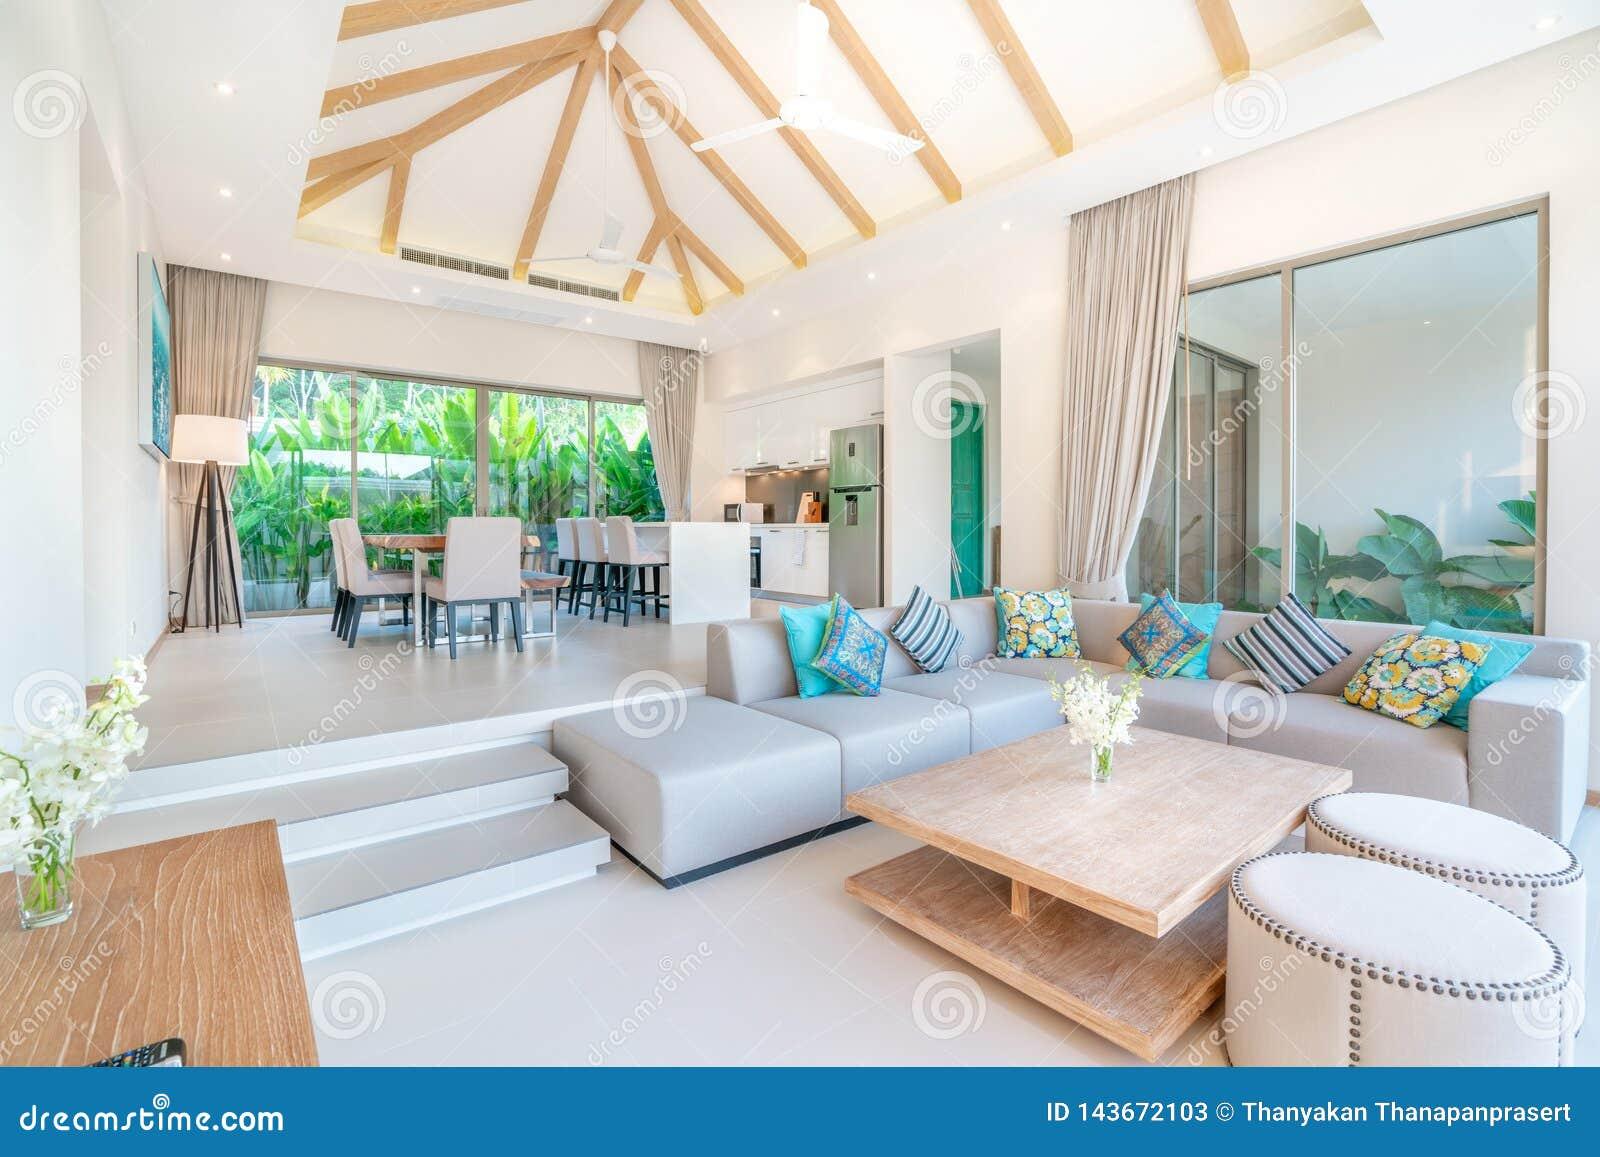 Luxury Interior Design In Living Room Of Pool Villas. Airy